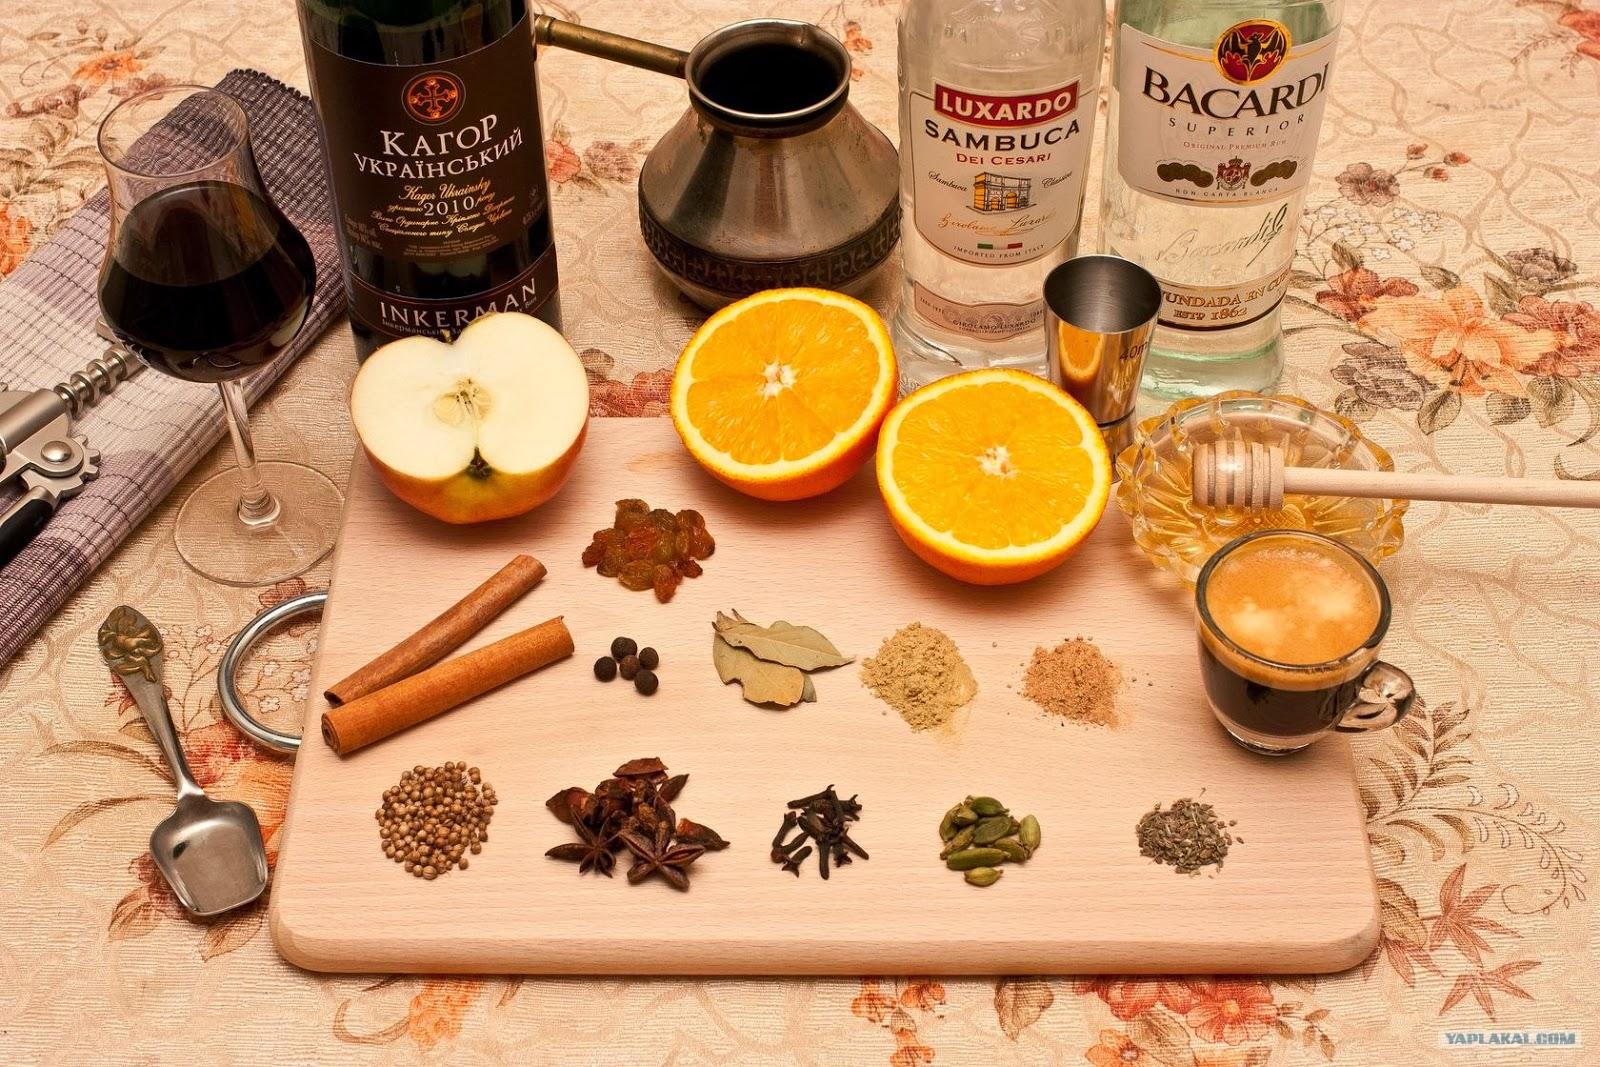 Рецепт глинтвейн в домашних условиях рецепт с